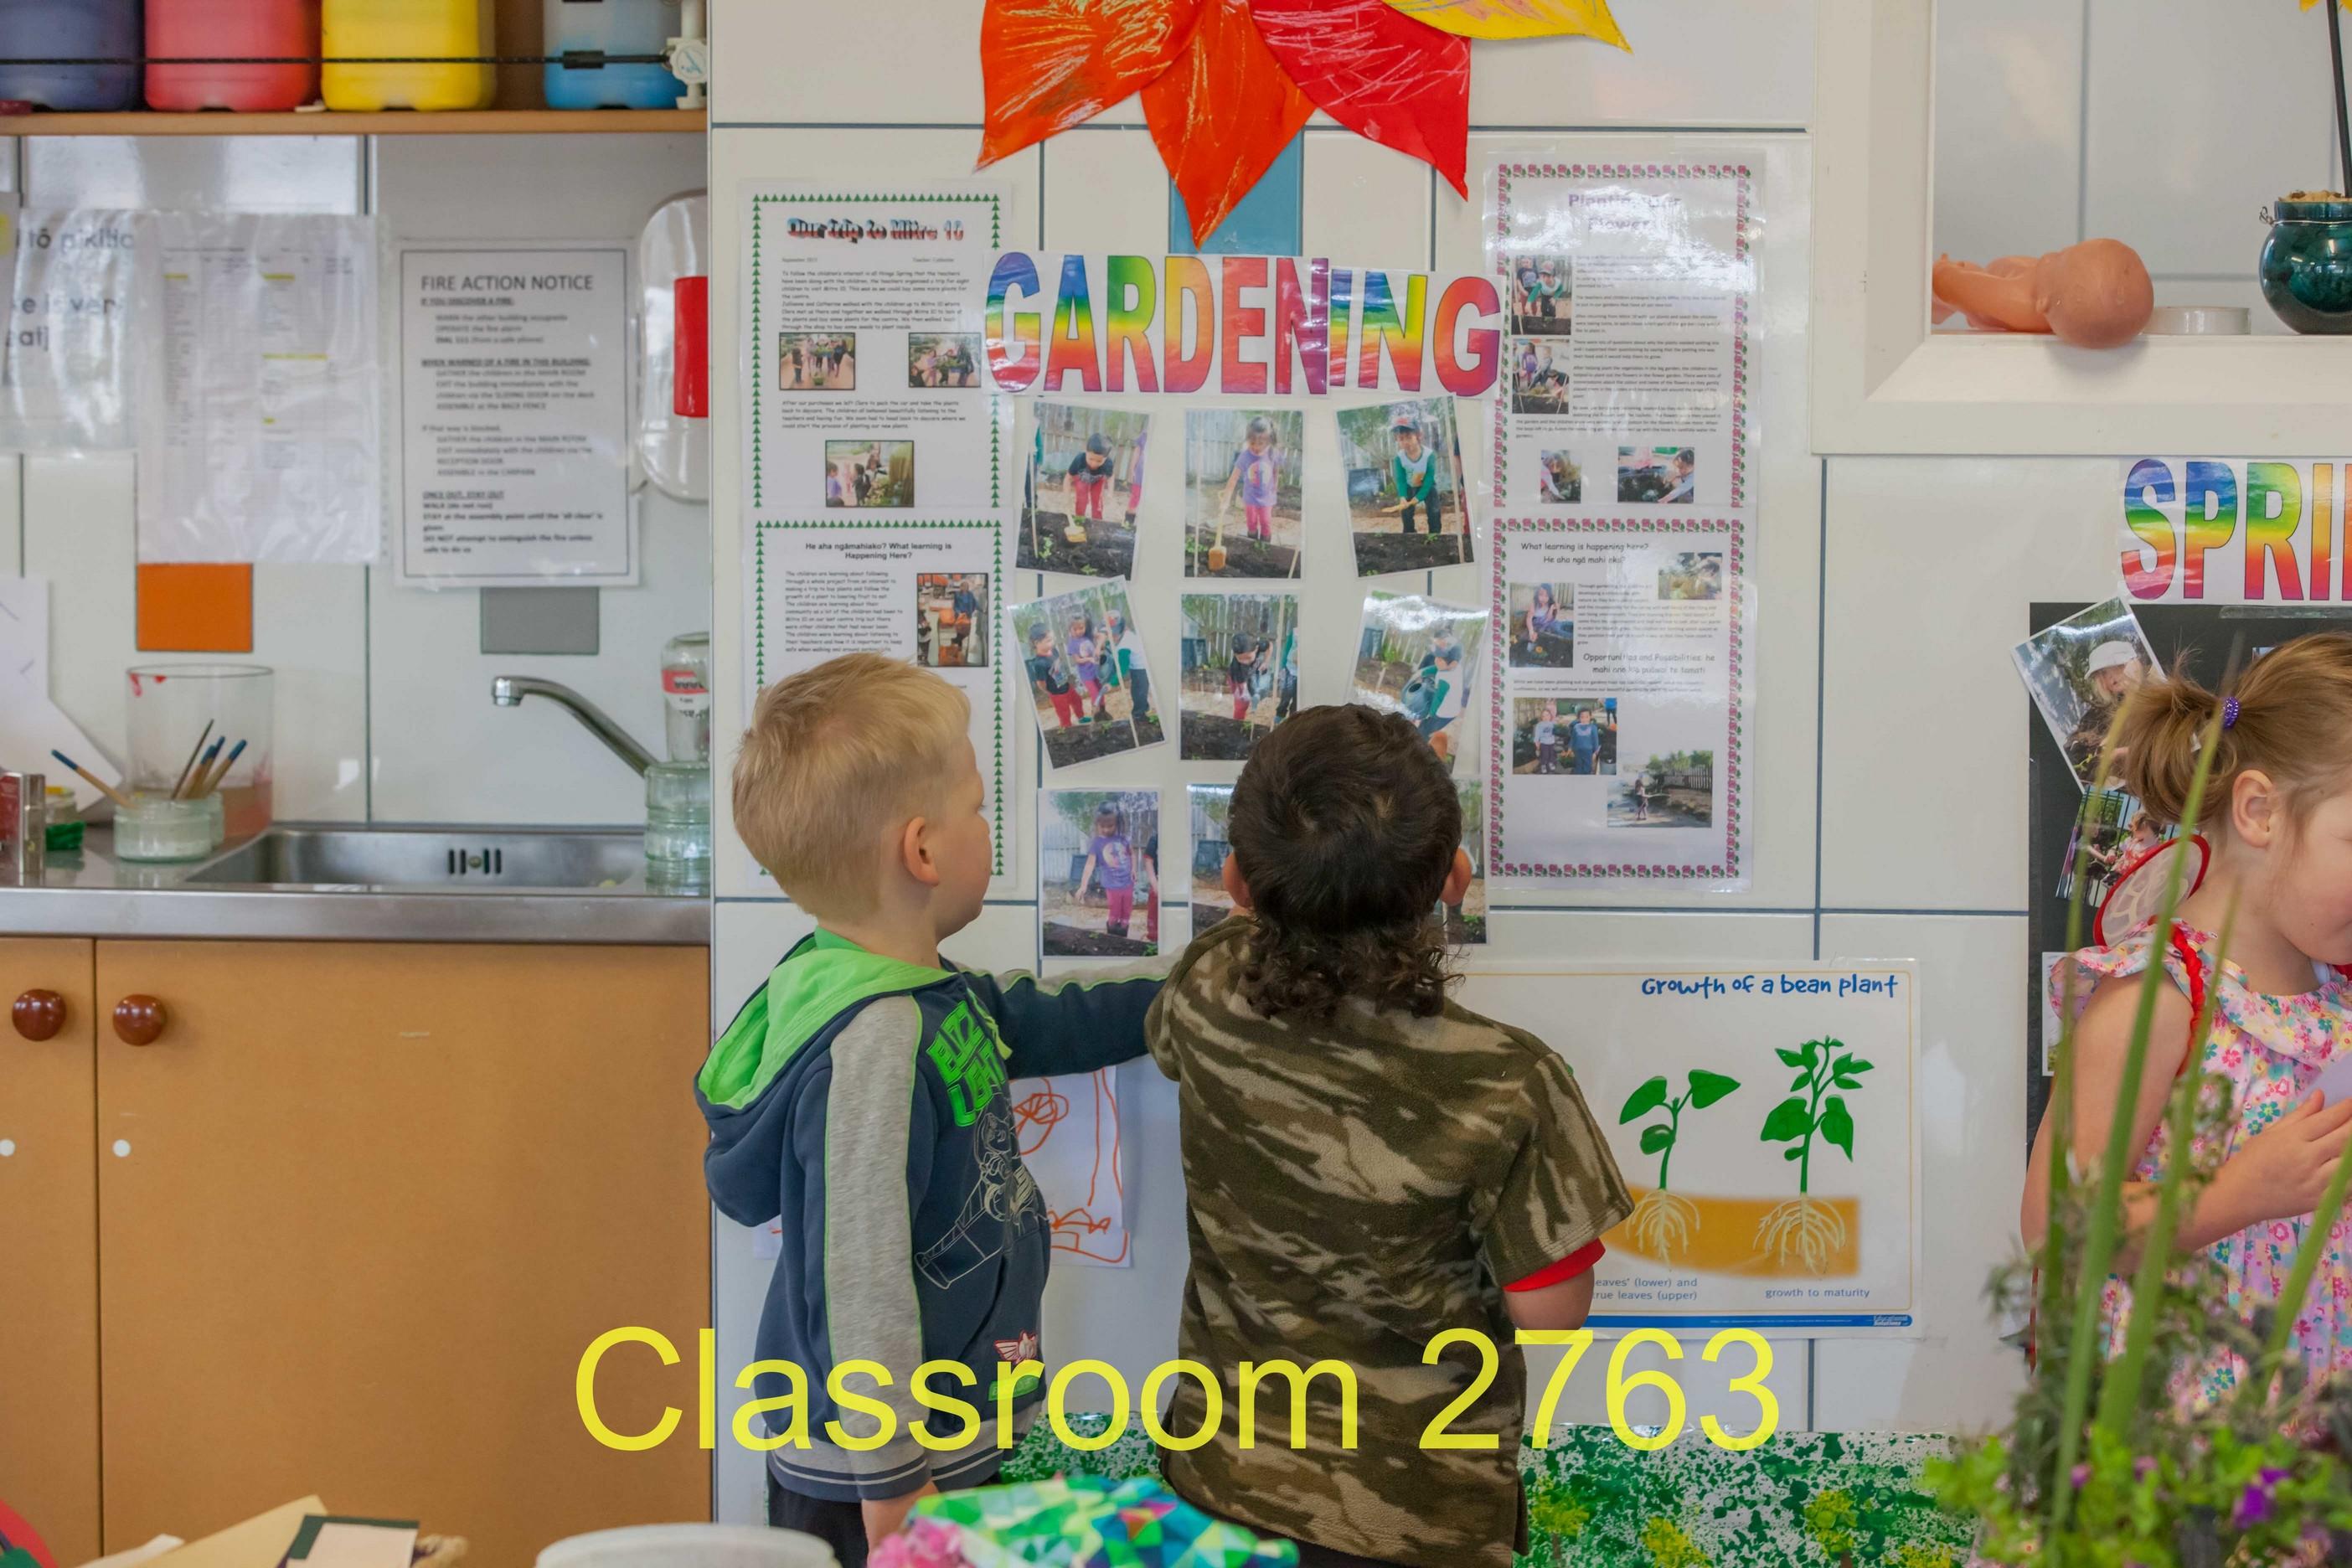 Classroom 2763